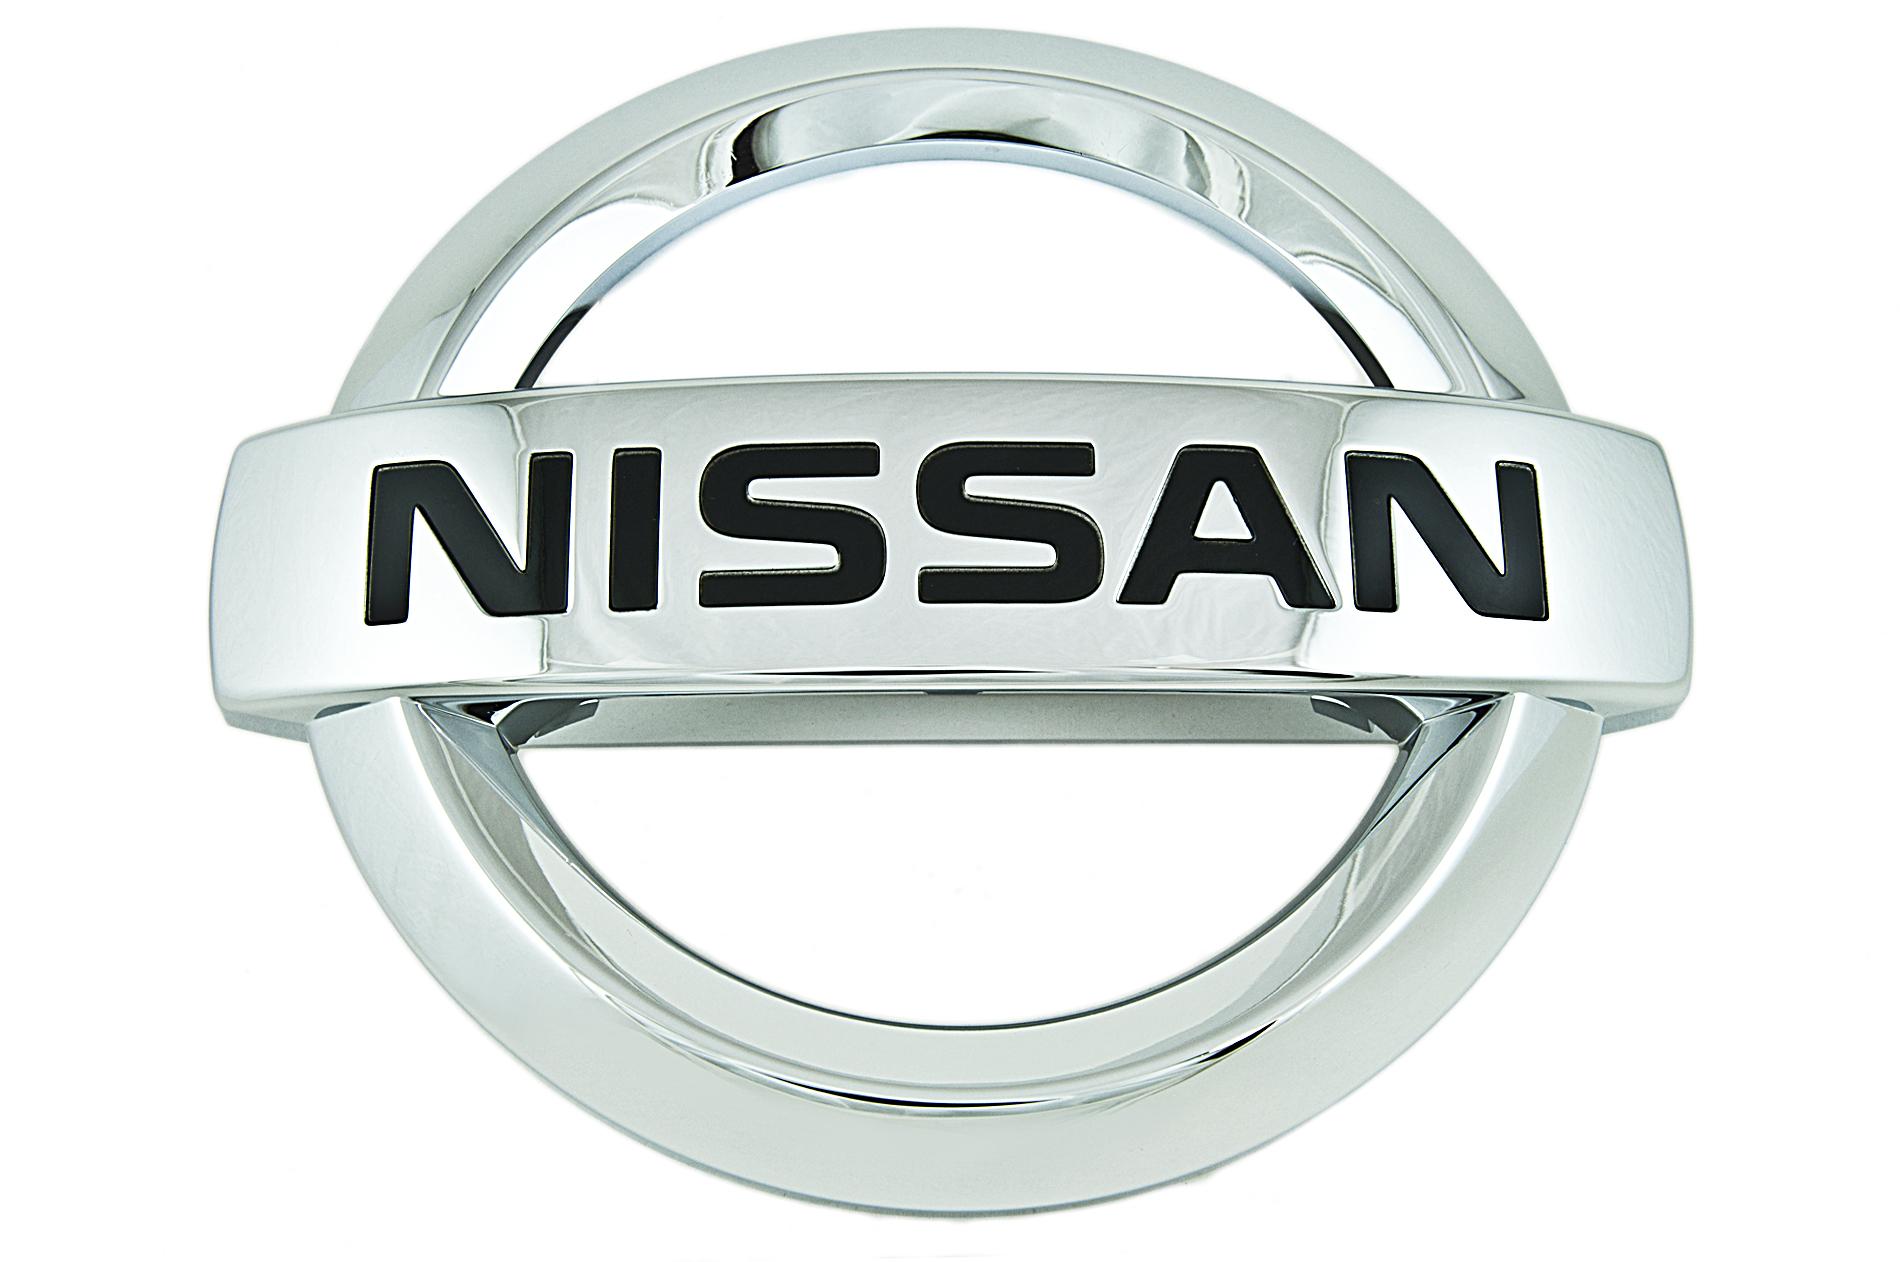 Nissan Genuine Qashqai Front Emblem Badge Logo For Bonnet